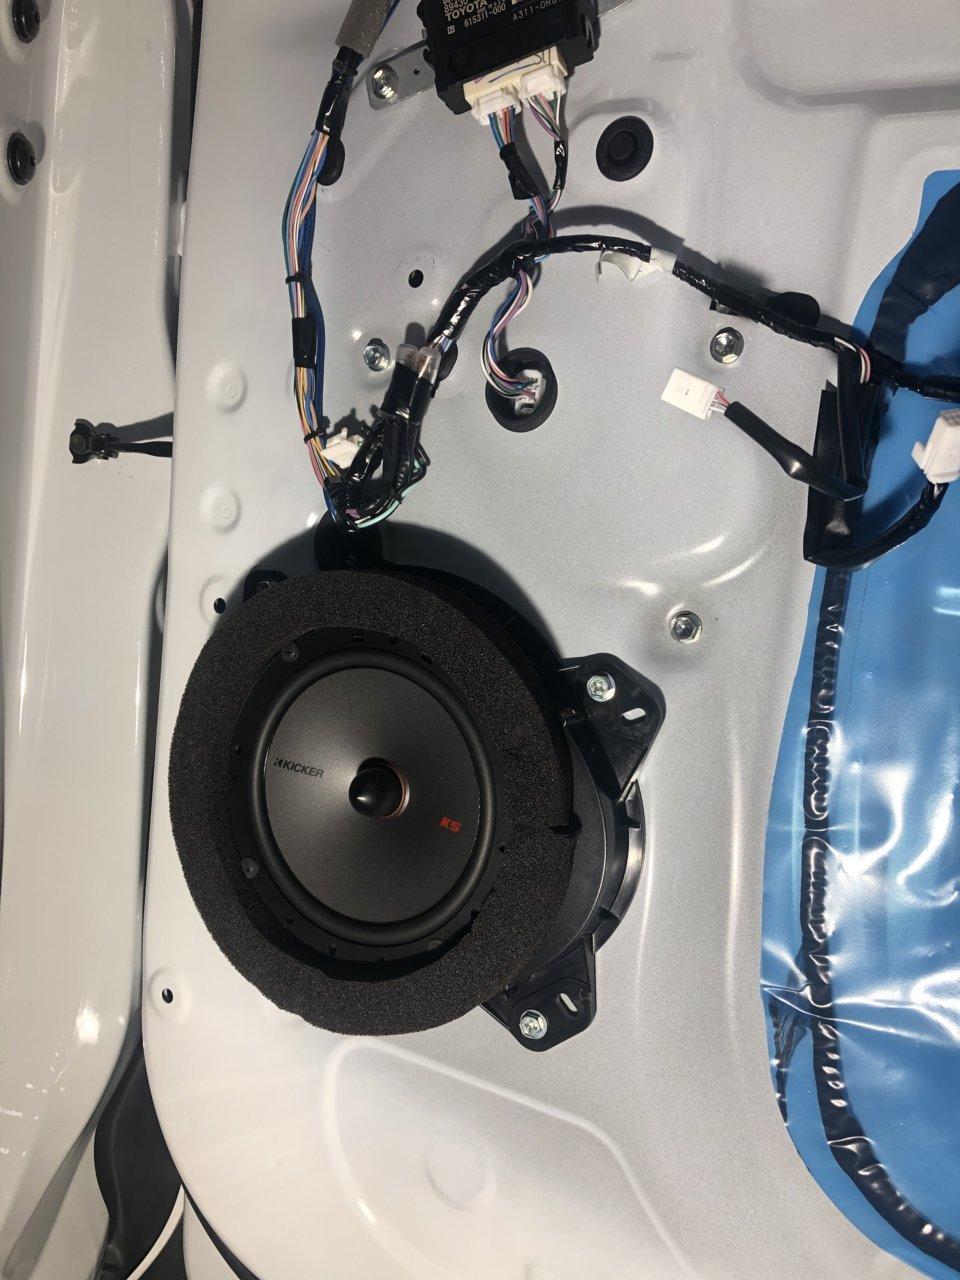 Kicker upgrade with stock JBL head unit. | Toyota Tundra Forum on technics amp, ampeg amp, jimmy page amp, nad amp, hi-fi stereo power amp, guitar amp, sonos amp, cerwin vega amp, power bass amp, harman kardon amp, mackie amp, eric clapton amp, onkyo amp, peavey amp, luxman amp, pyle amp, 4 channel amp, cisco amp, denon amp, alesis amp,